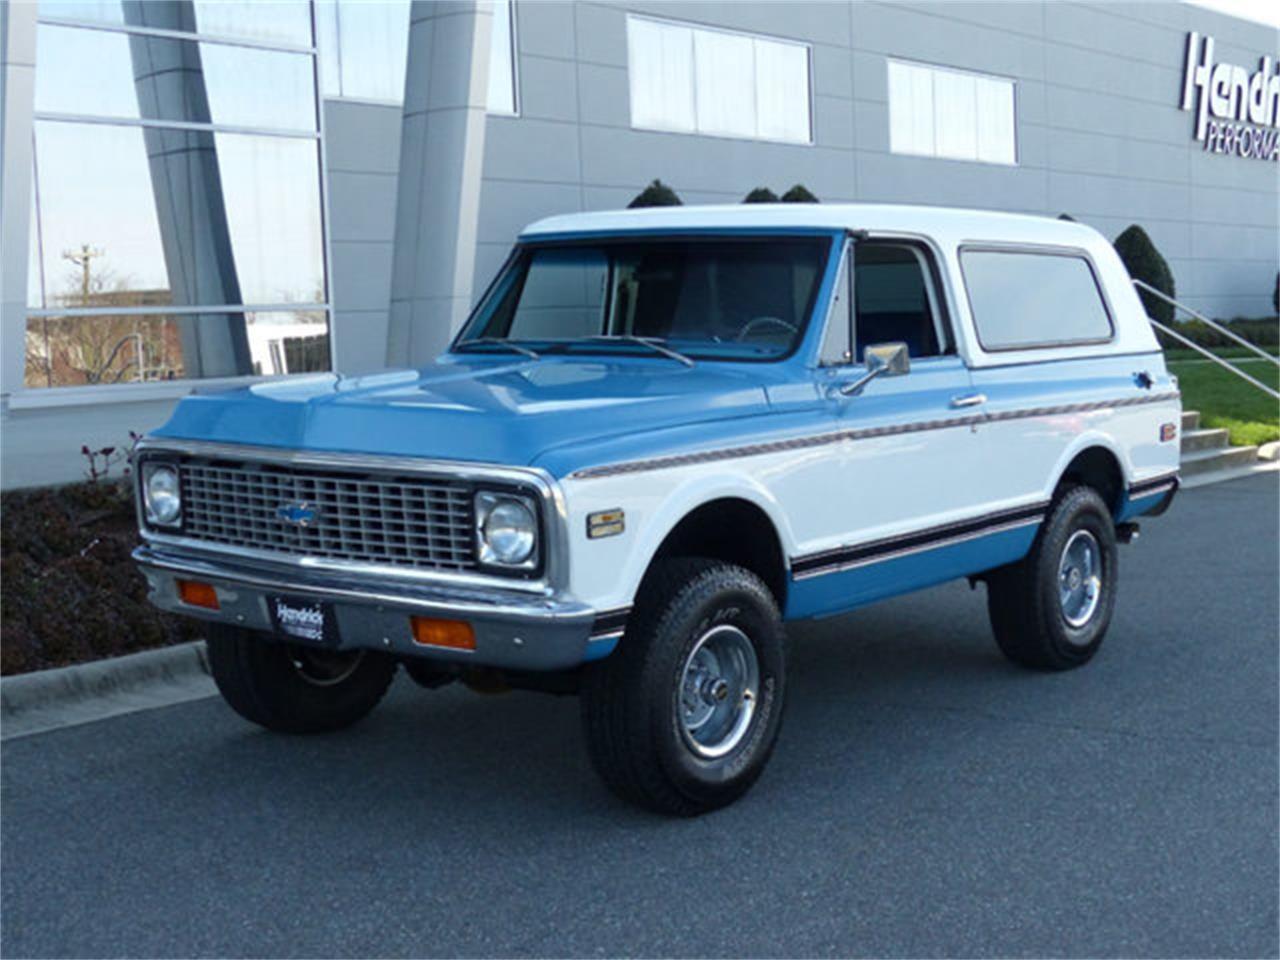 1972 Chevrolet Blazer (CC-1197066) for sale in Charlotte, North Carolina